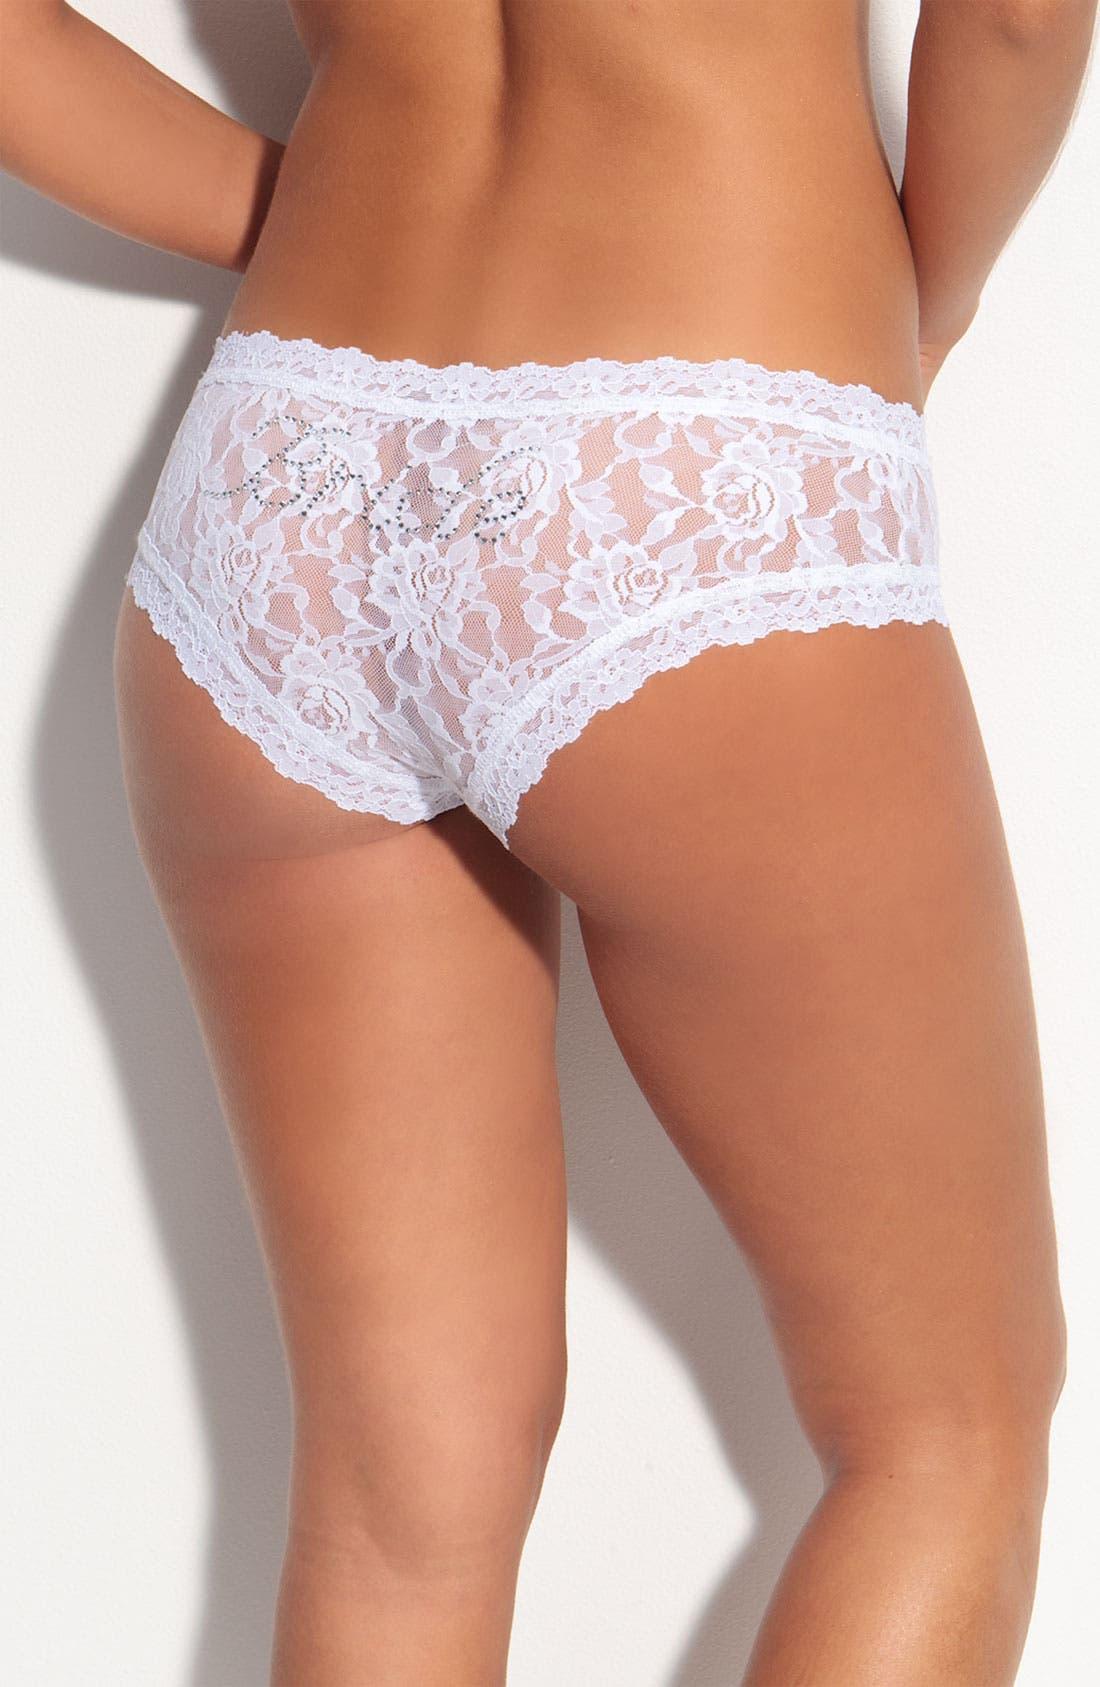 Hanky Panky 'Bride' Lace Hipster Panties